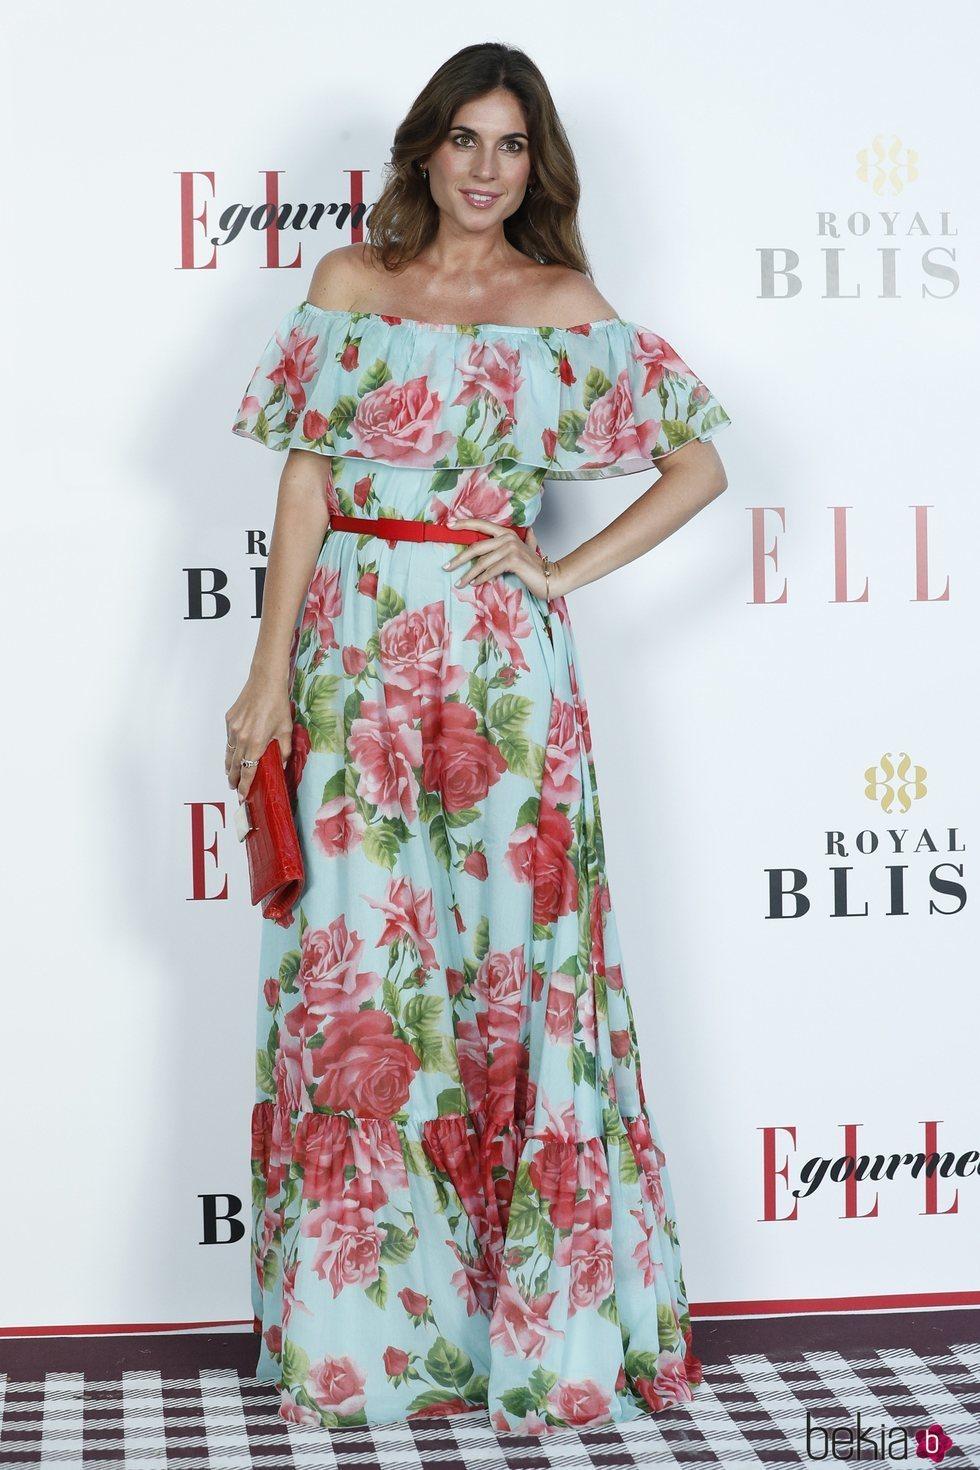 Lourdes Montes en los Elle Gourmet Awards 2018